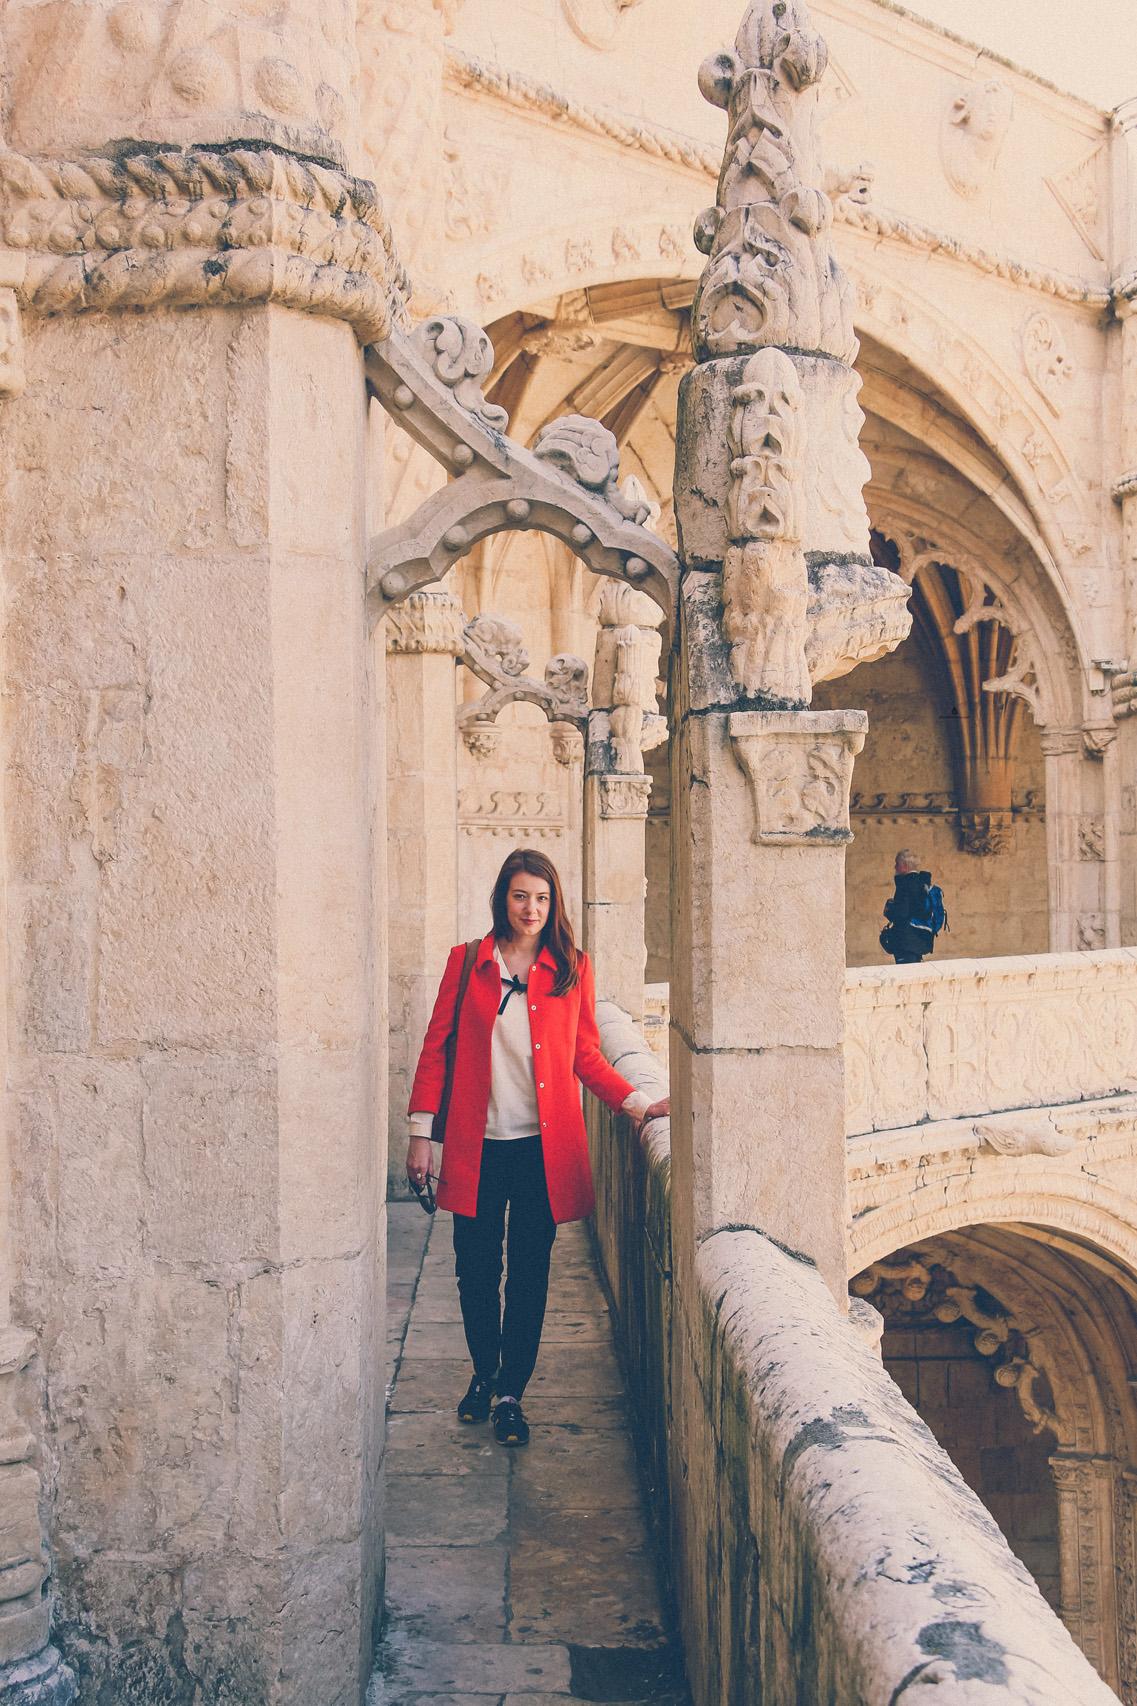 In Jeronimos monastery, Lisbon